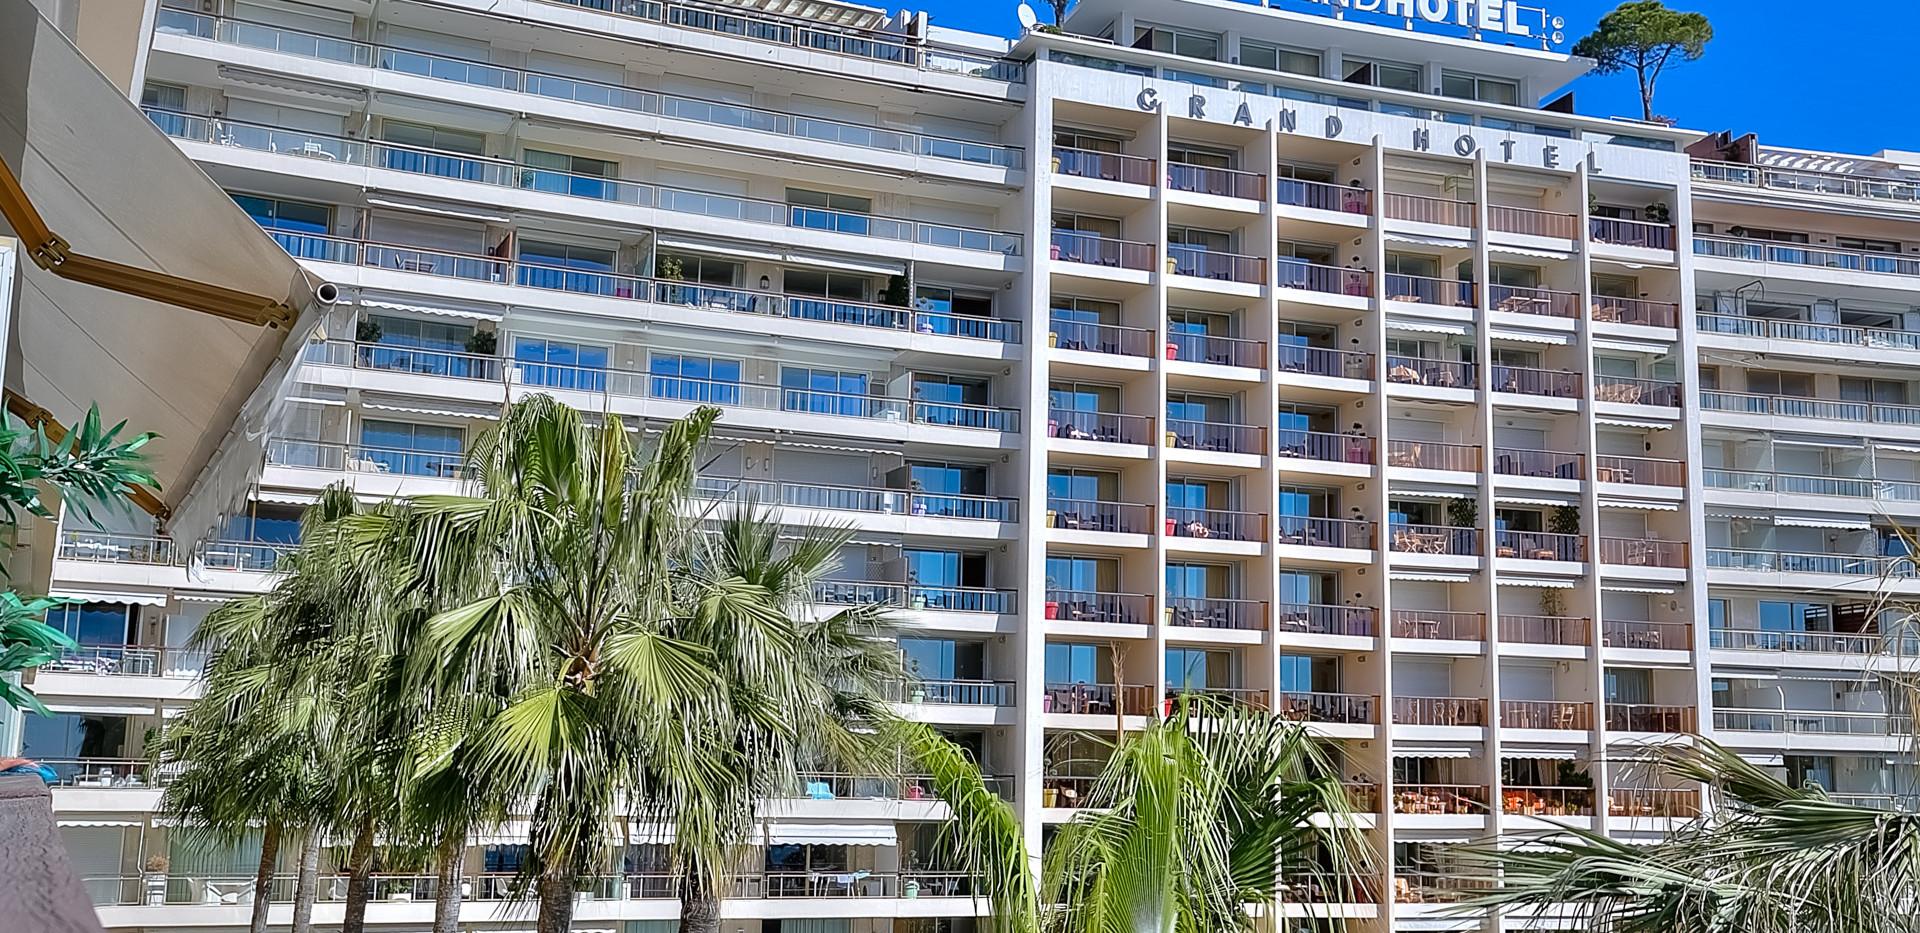 grand hotel-10.jpg